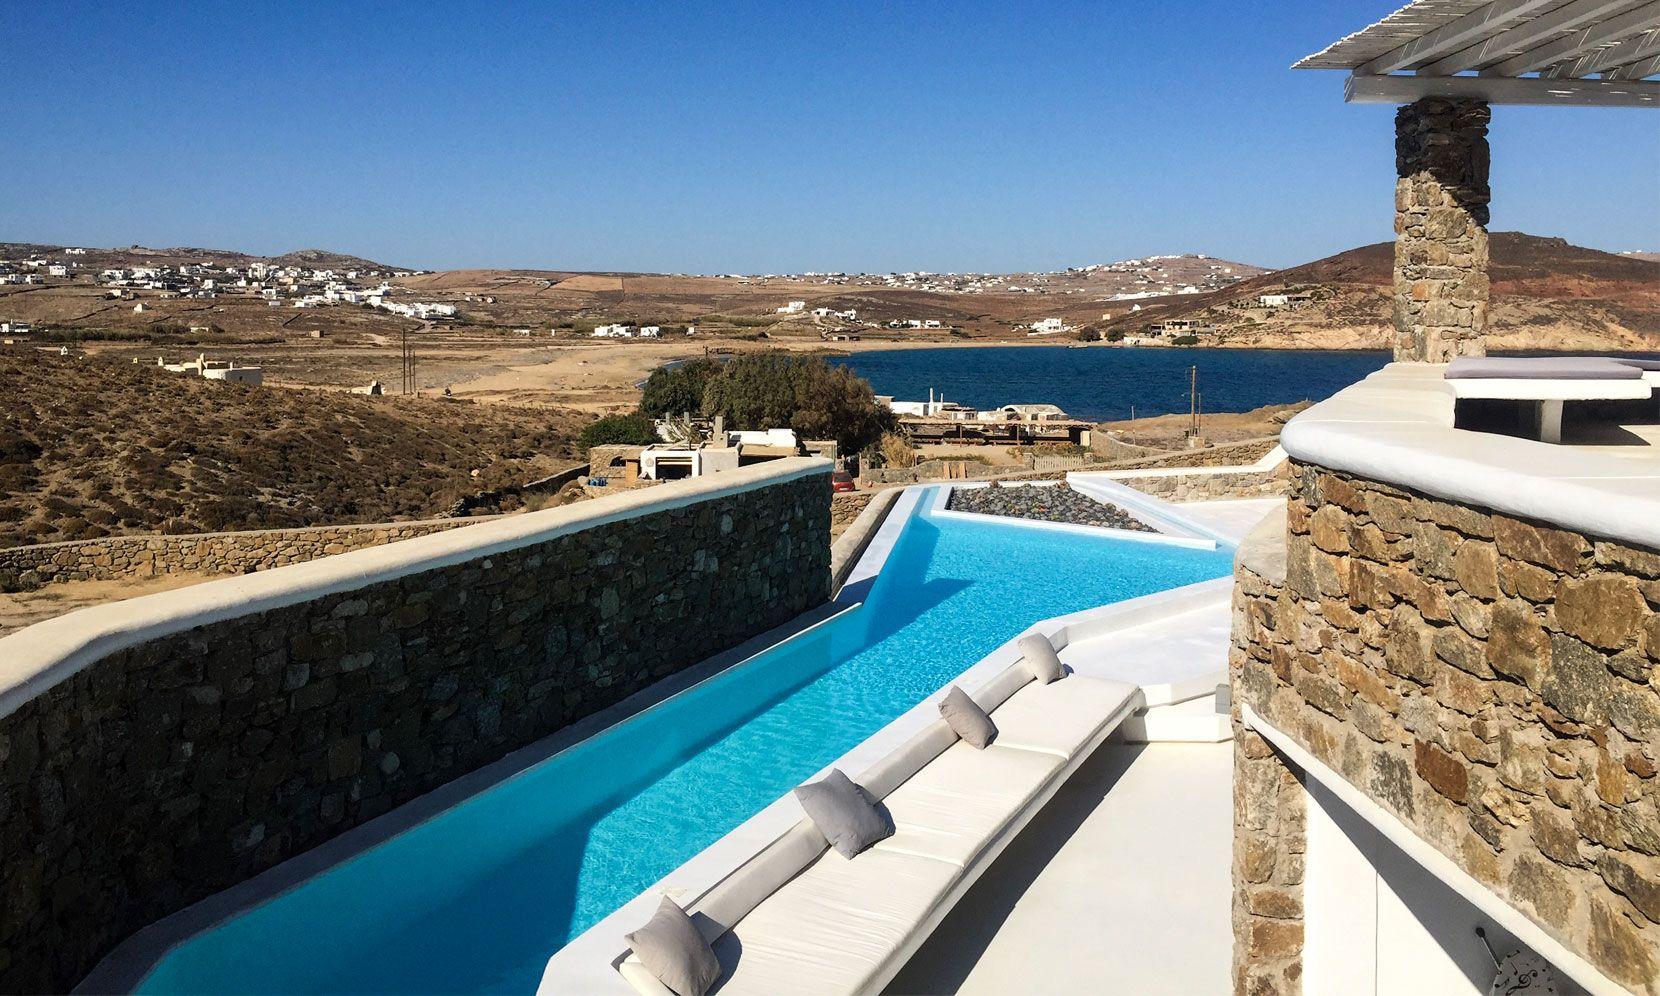 Mykonos Villa Thalassophile jumbotron image